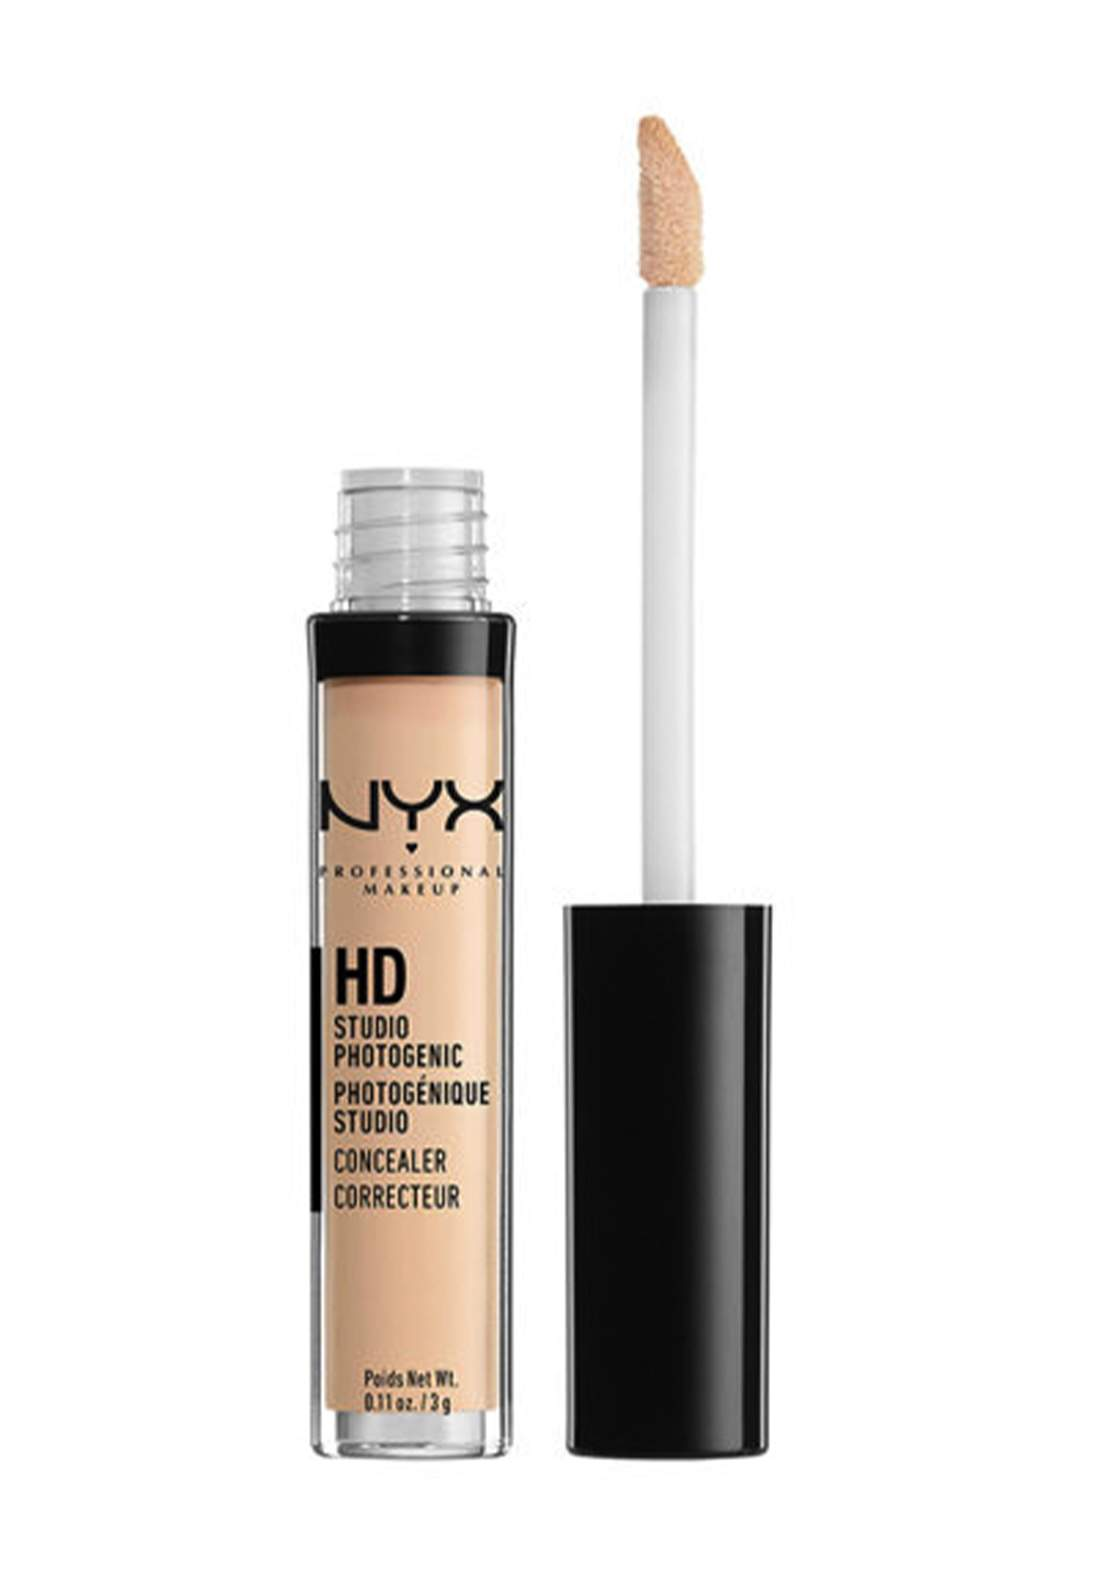 Nyx Professional Makeup HD Concealer No.02 Fair 3g كونسيلر